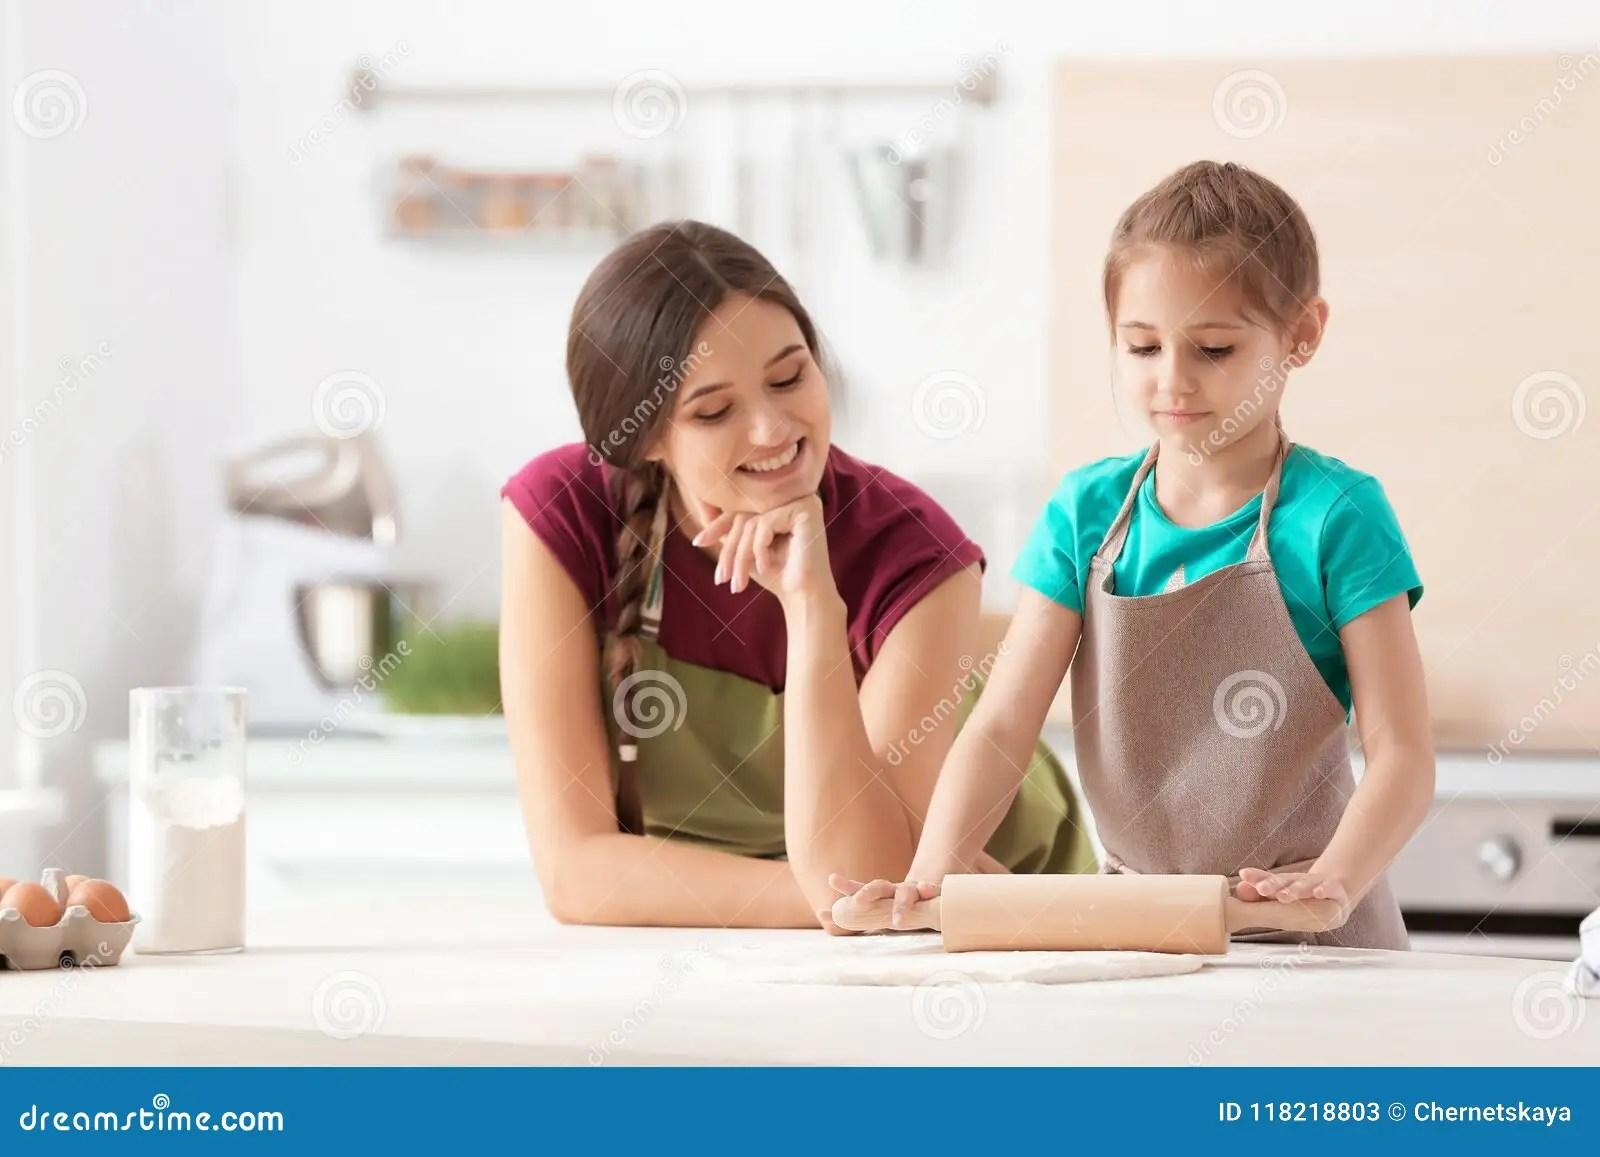 kitchen prep table design my 在厨房里照顾和她的准备面团的女儿在桌上库存图片 图片包括有厨房 乐趣 在厨房里照顾和她准备面团的逗人喜爱的女儿在桌上